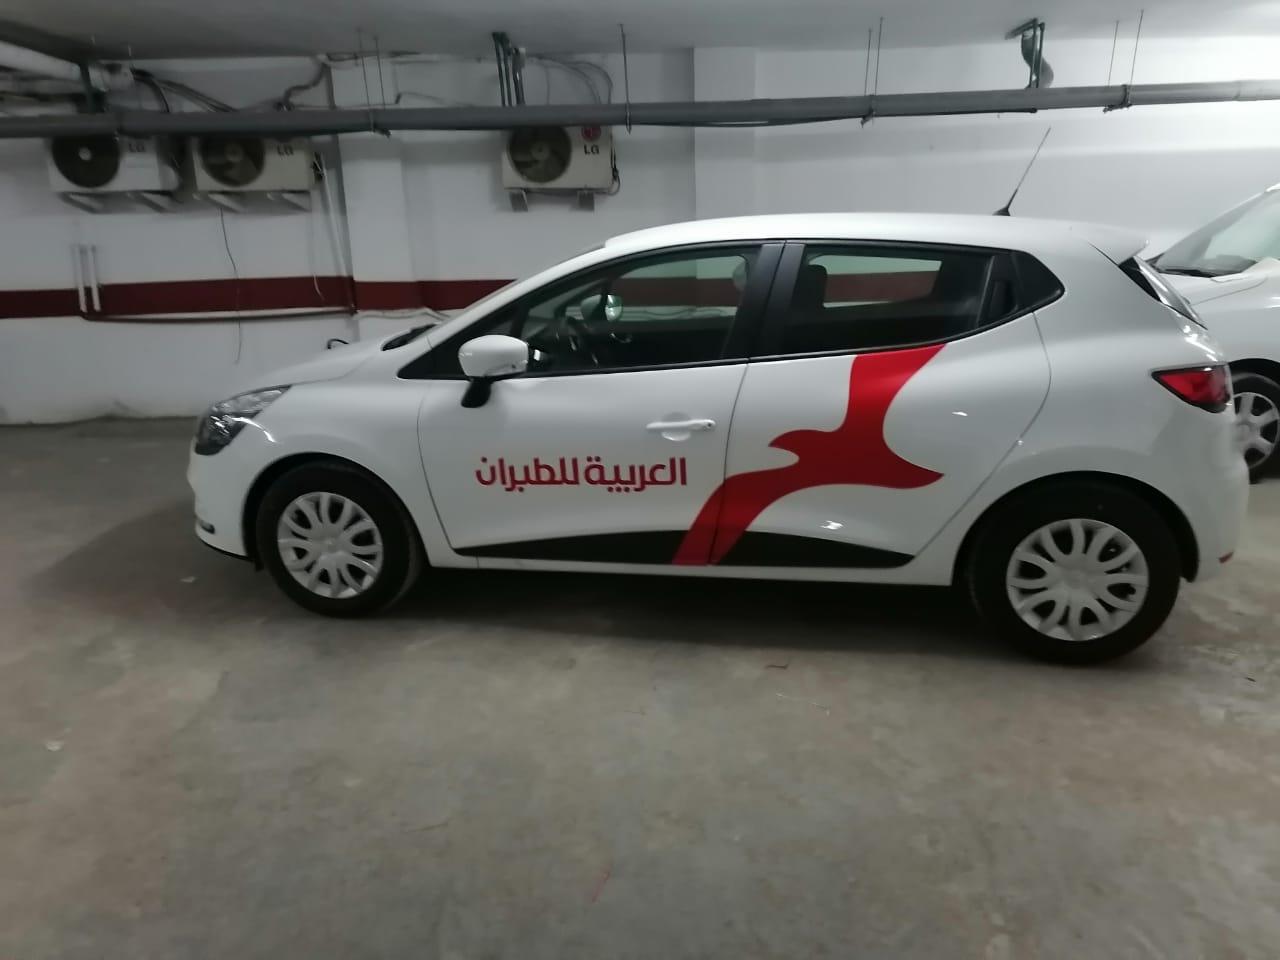 Air arabia habillage véhicule